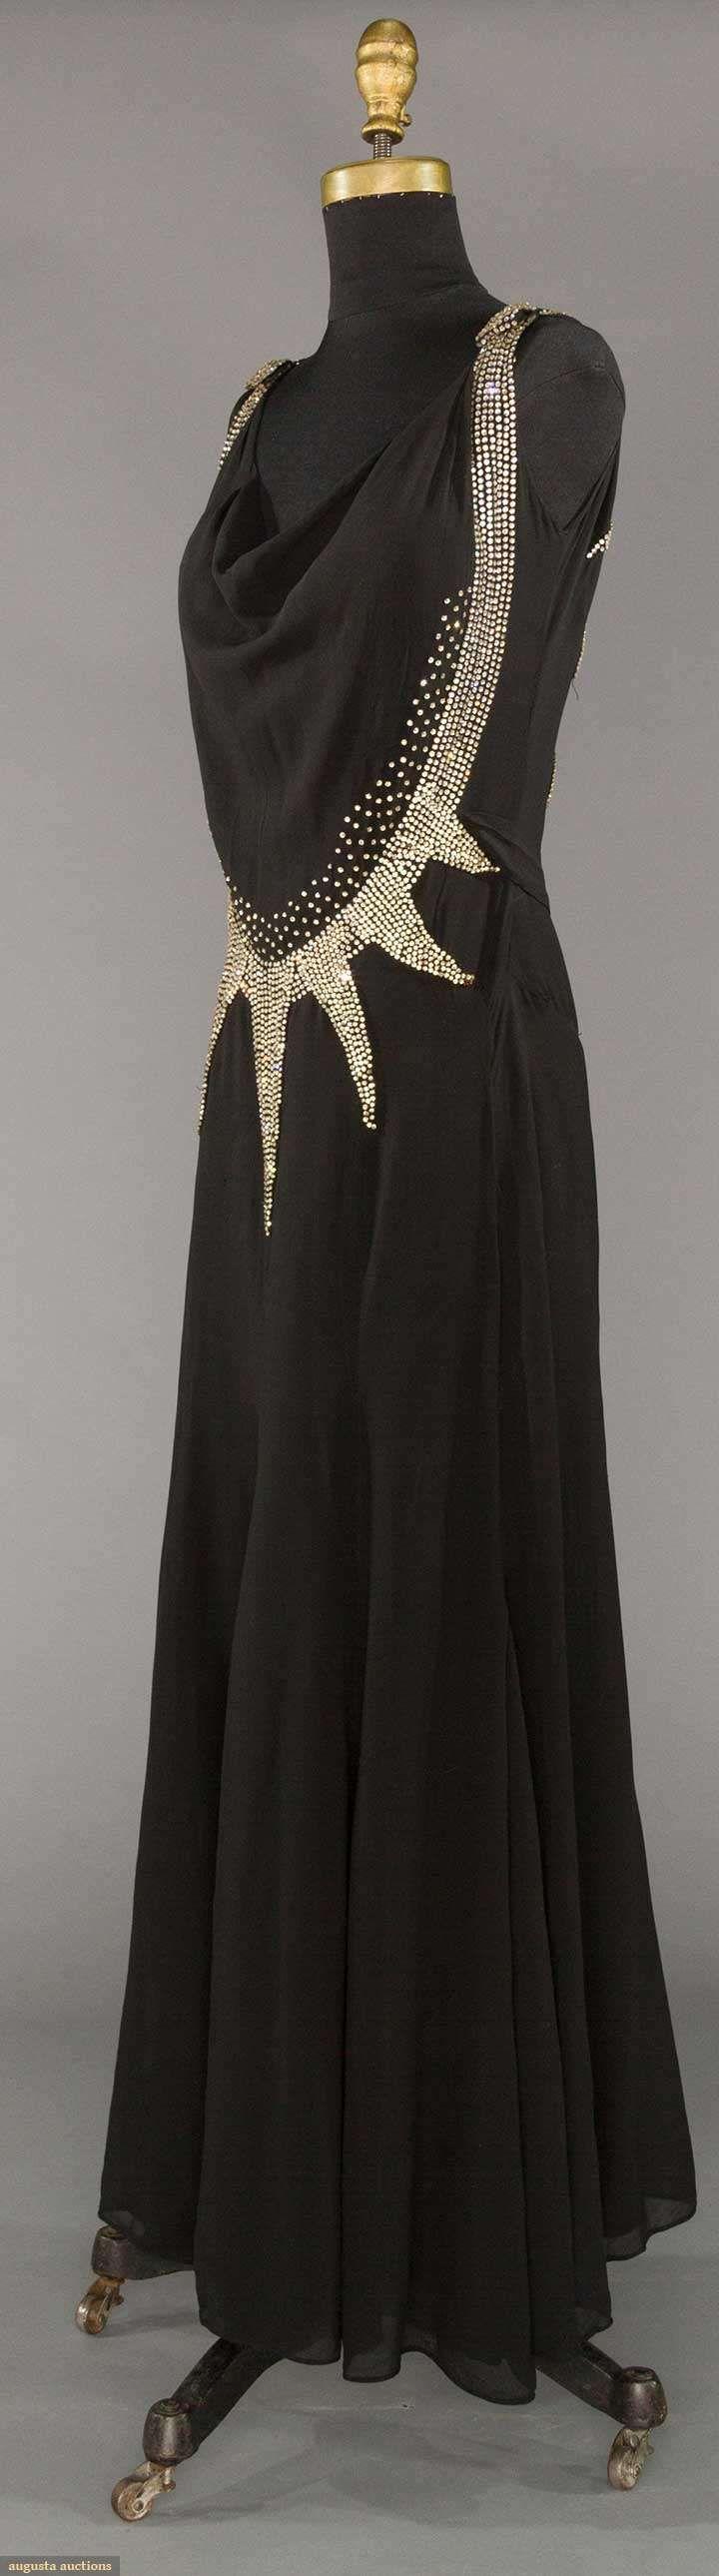 Art Deco Rhinestone Evening Dress, black silk chiffon, 1930's